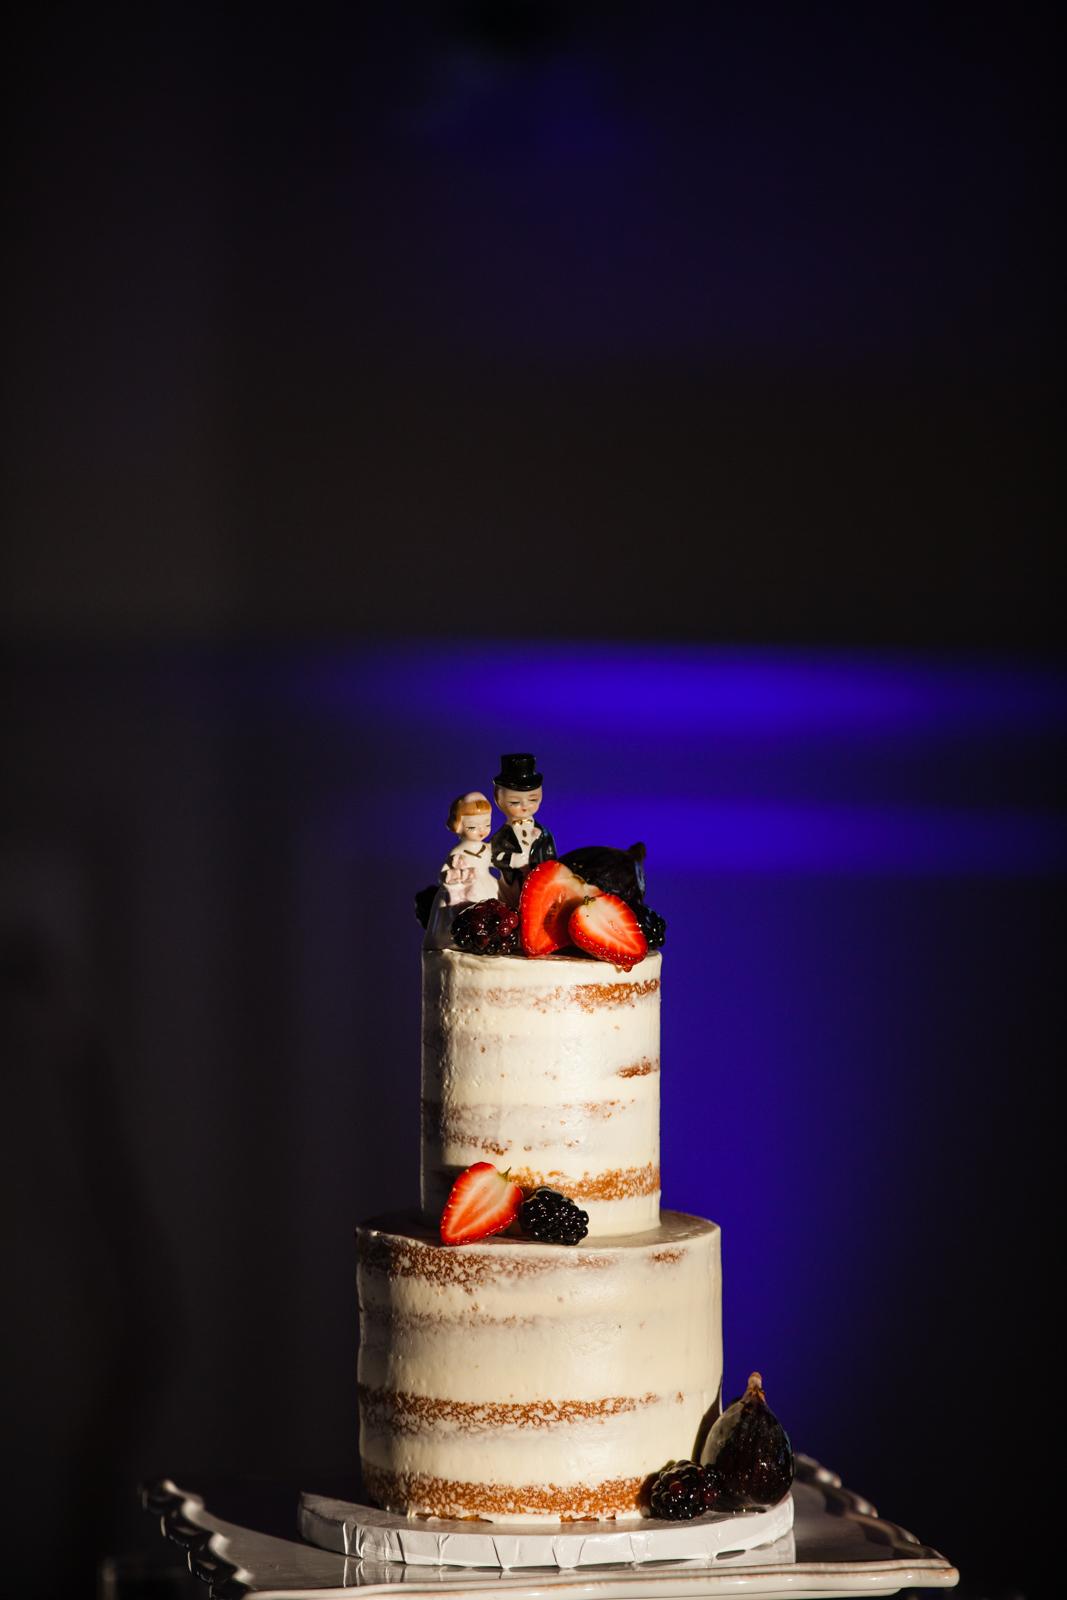 Eastons-Beach-Rotunda-Ballroom-Wedding-Newport-Rhode-Island-PhotographybyAmandaMorgan-94.jpg